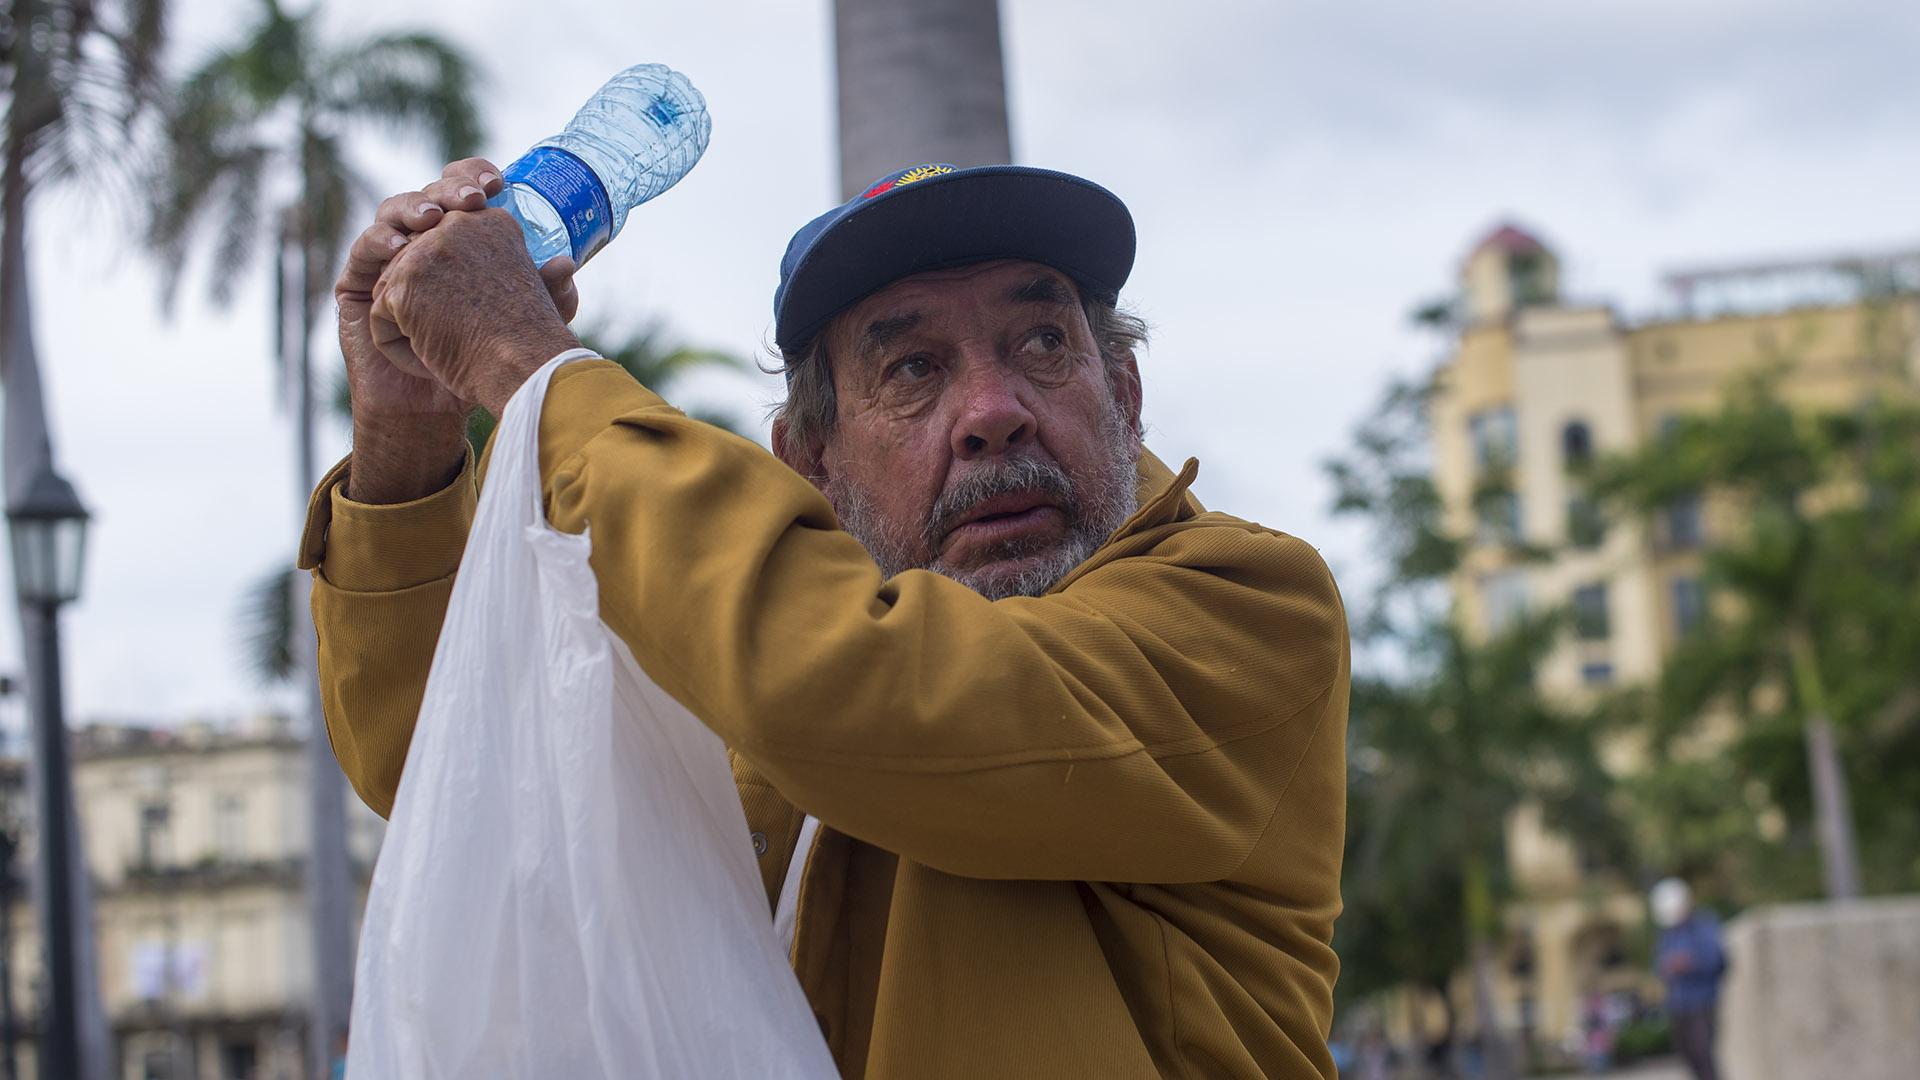 20180115 Havana 075 (1) (1) (1)